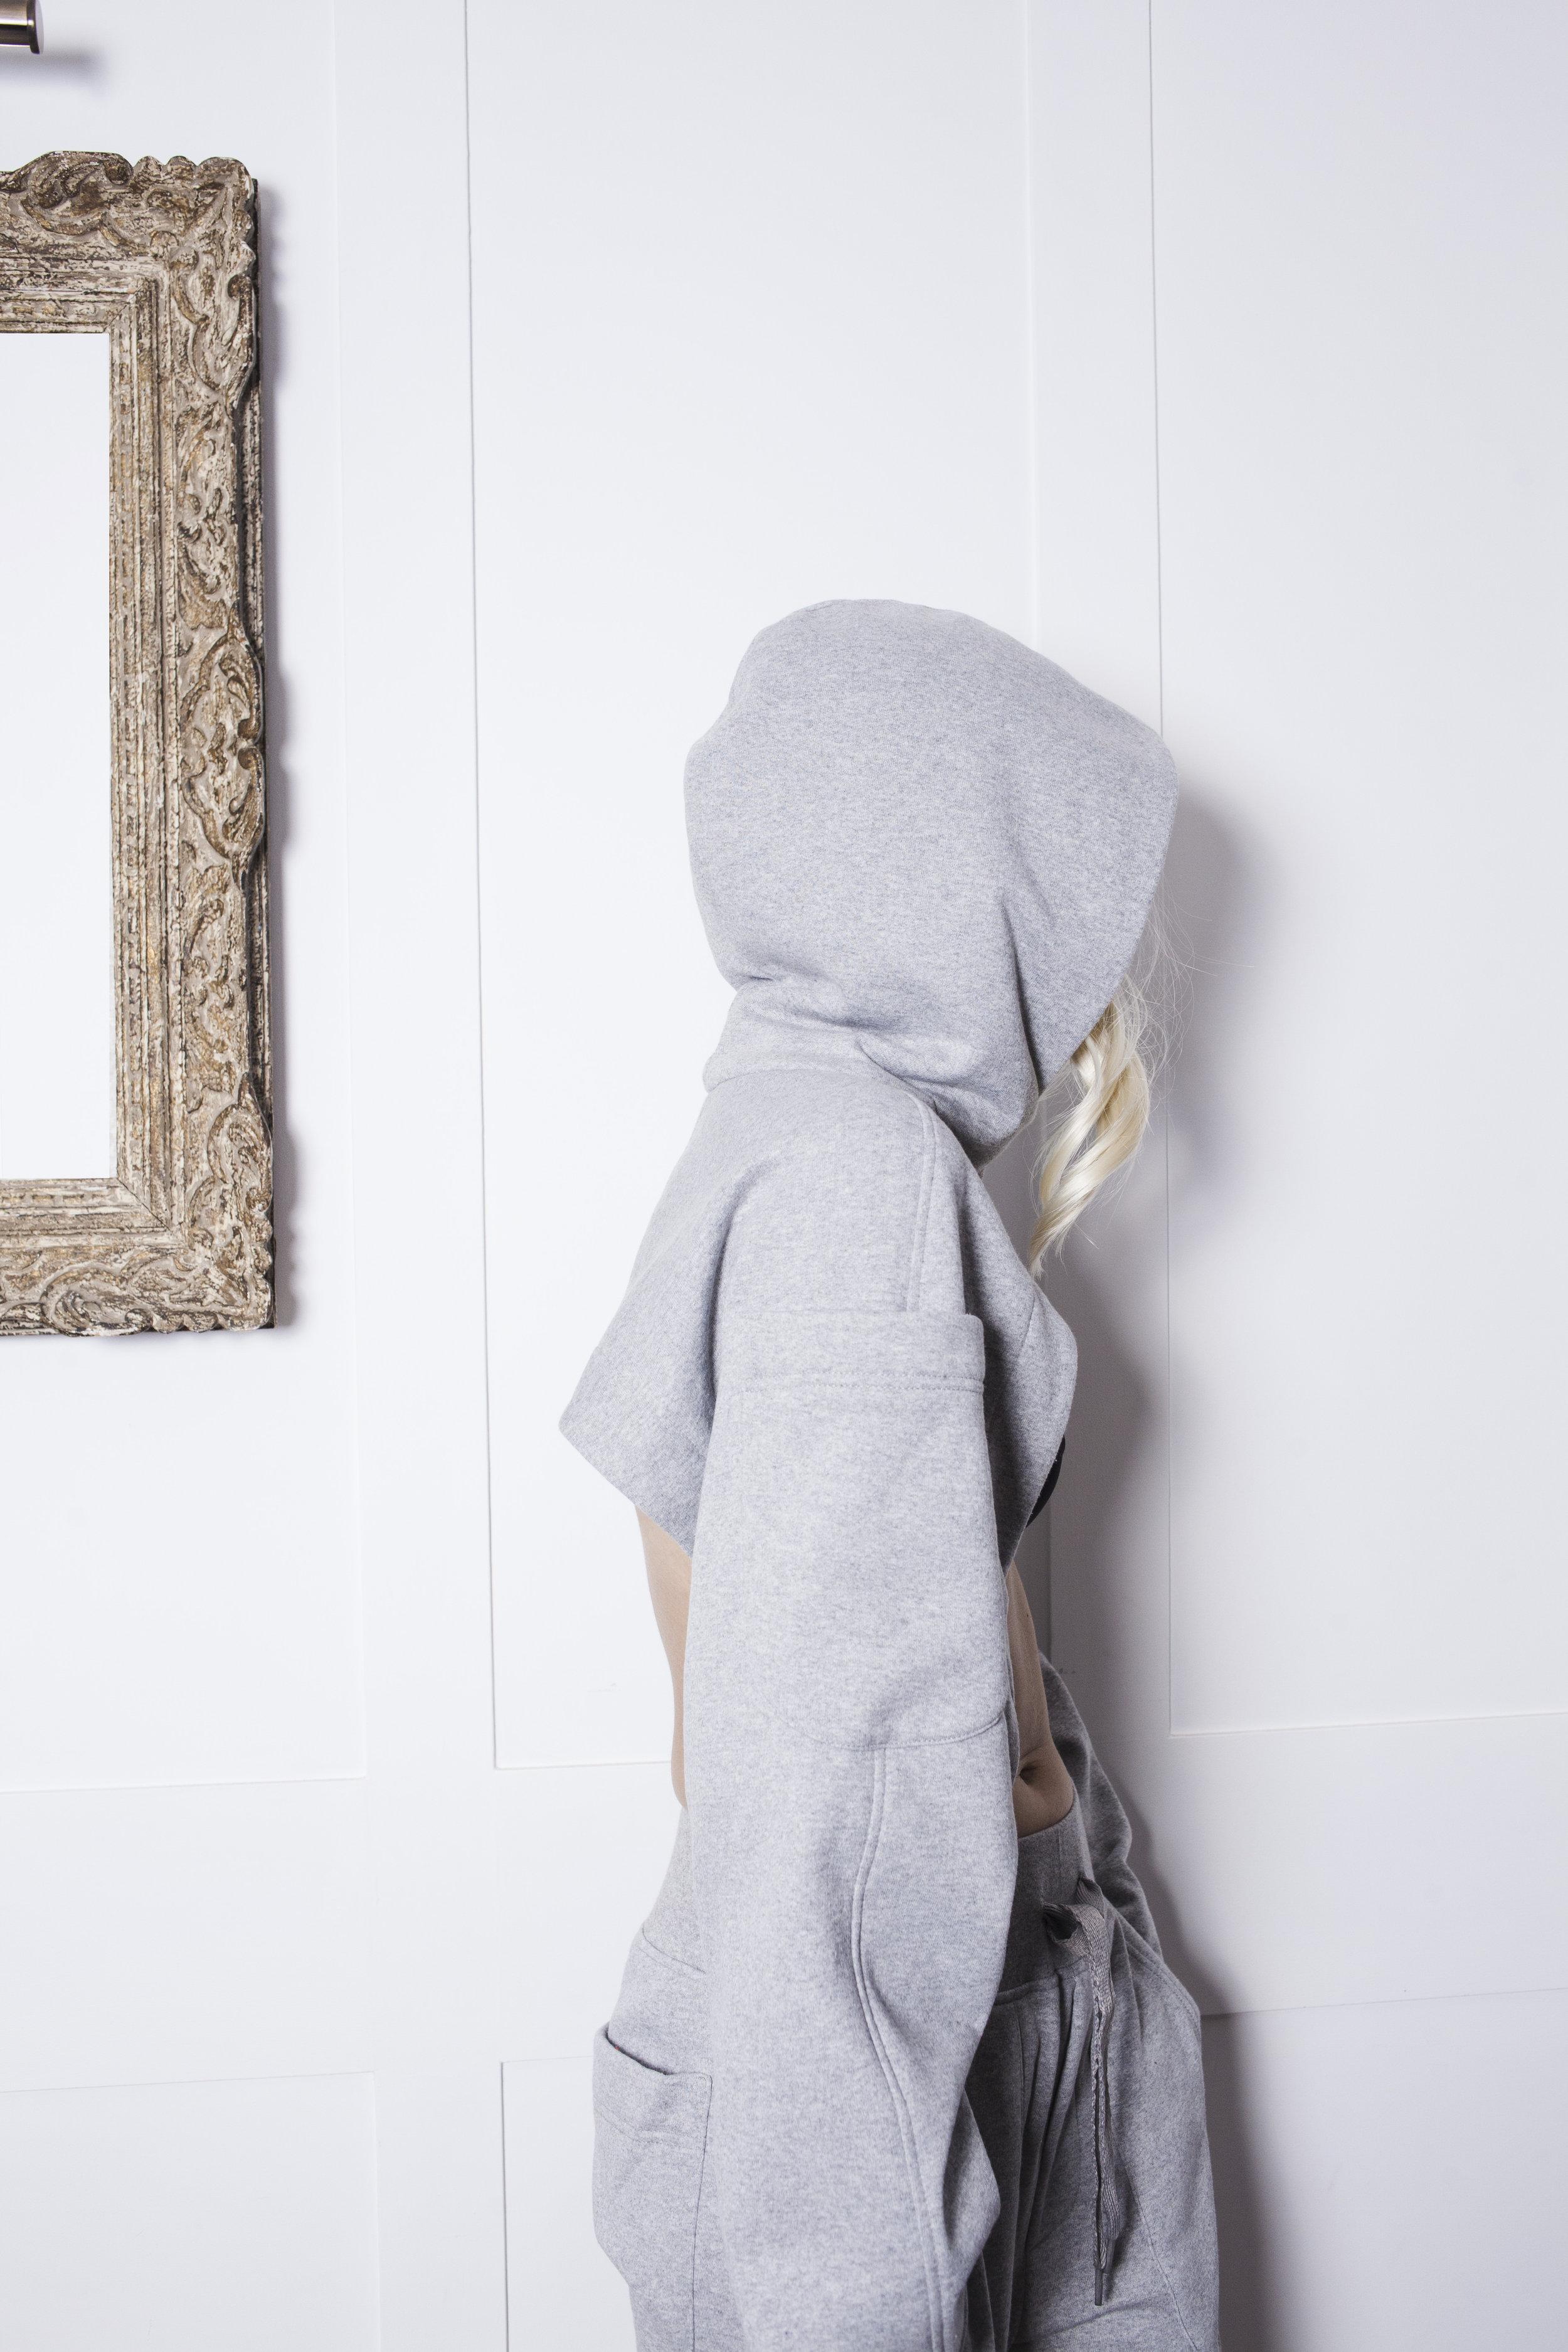 SWEATSHIRT NO. 5  Jogger Hoodie SHRUG  w/ 3D sleeve pockets